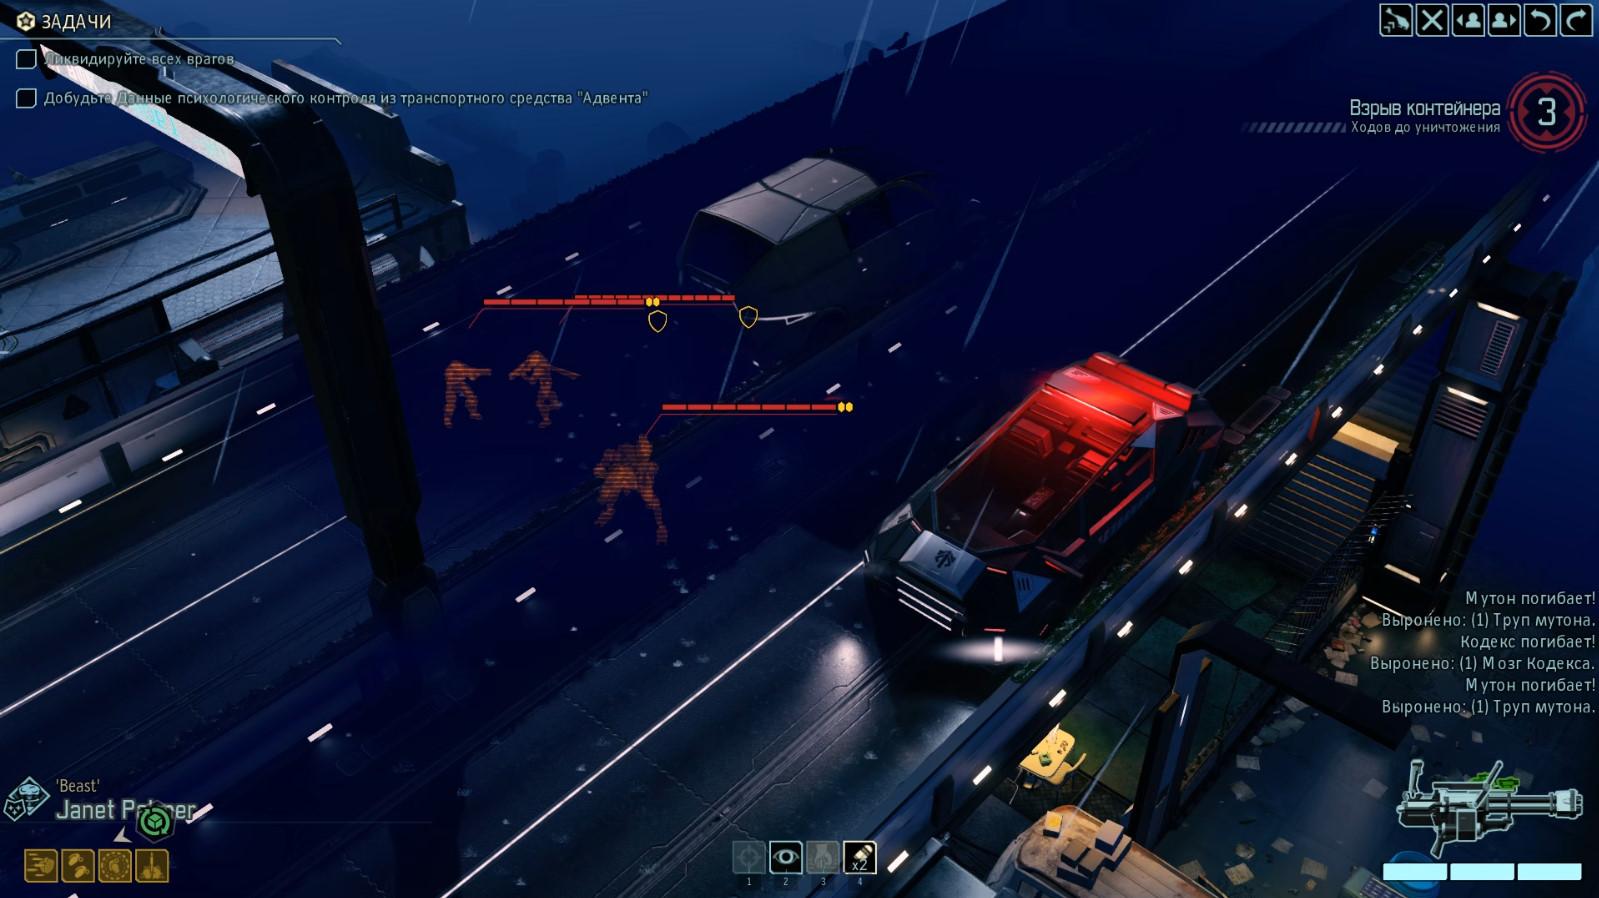 Враги под мостом.jpg - XCOM 2